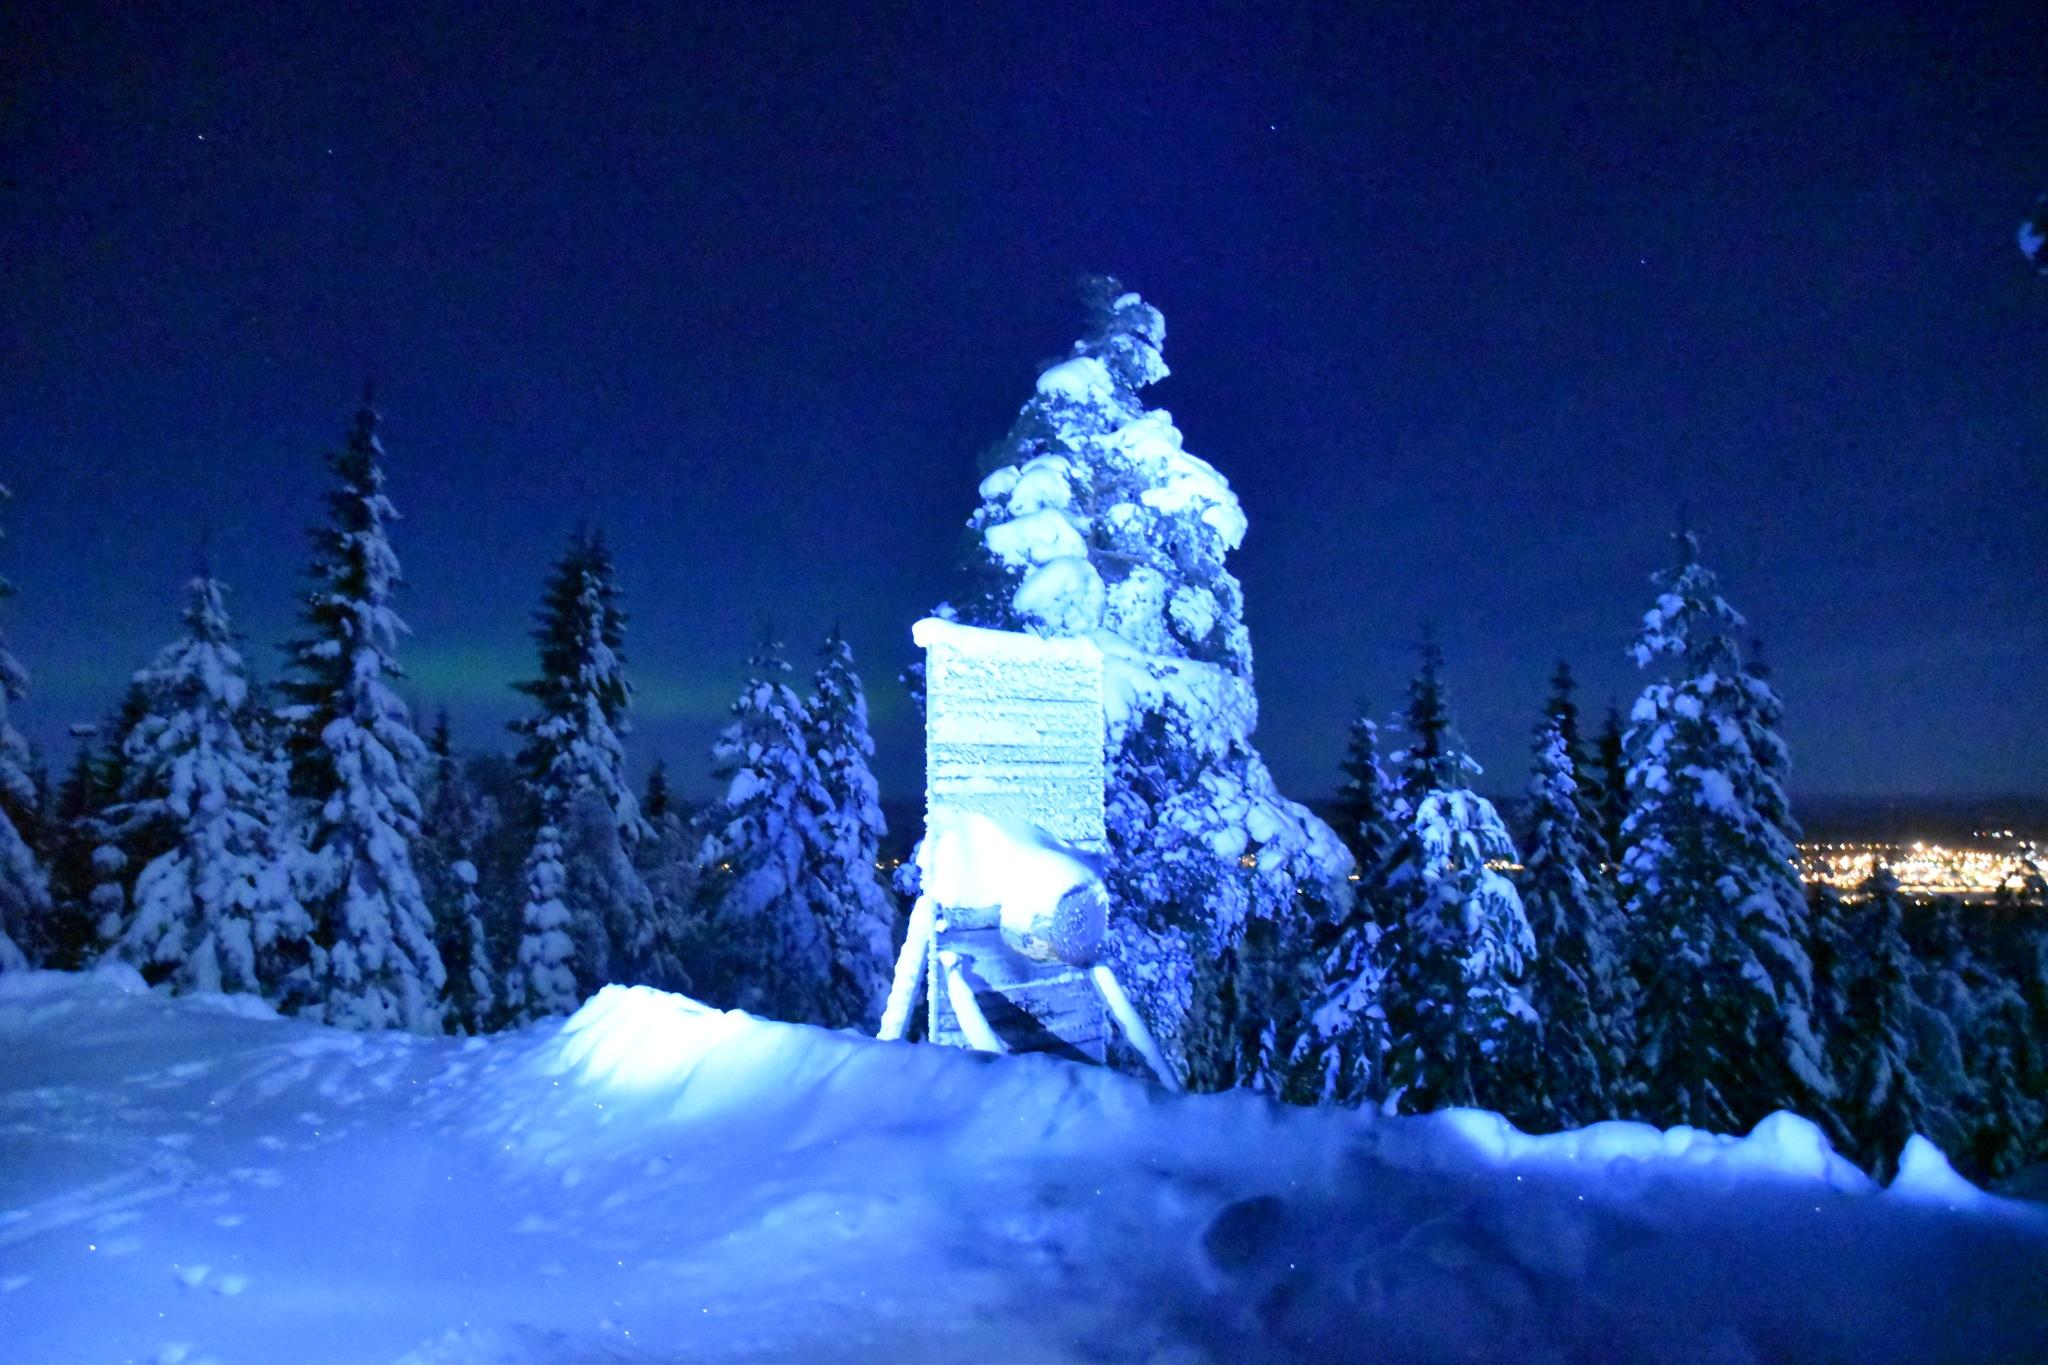 Late walk in the moonlight by Susanne Olsson